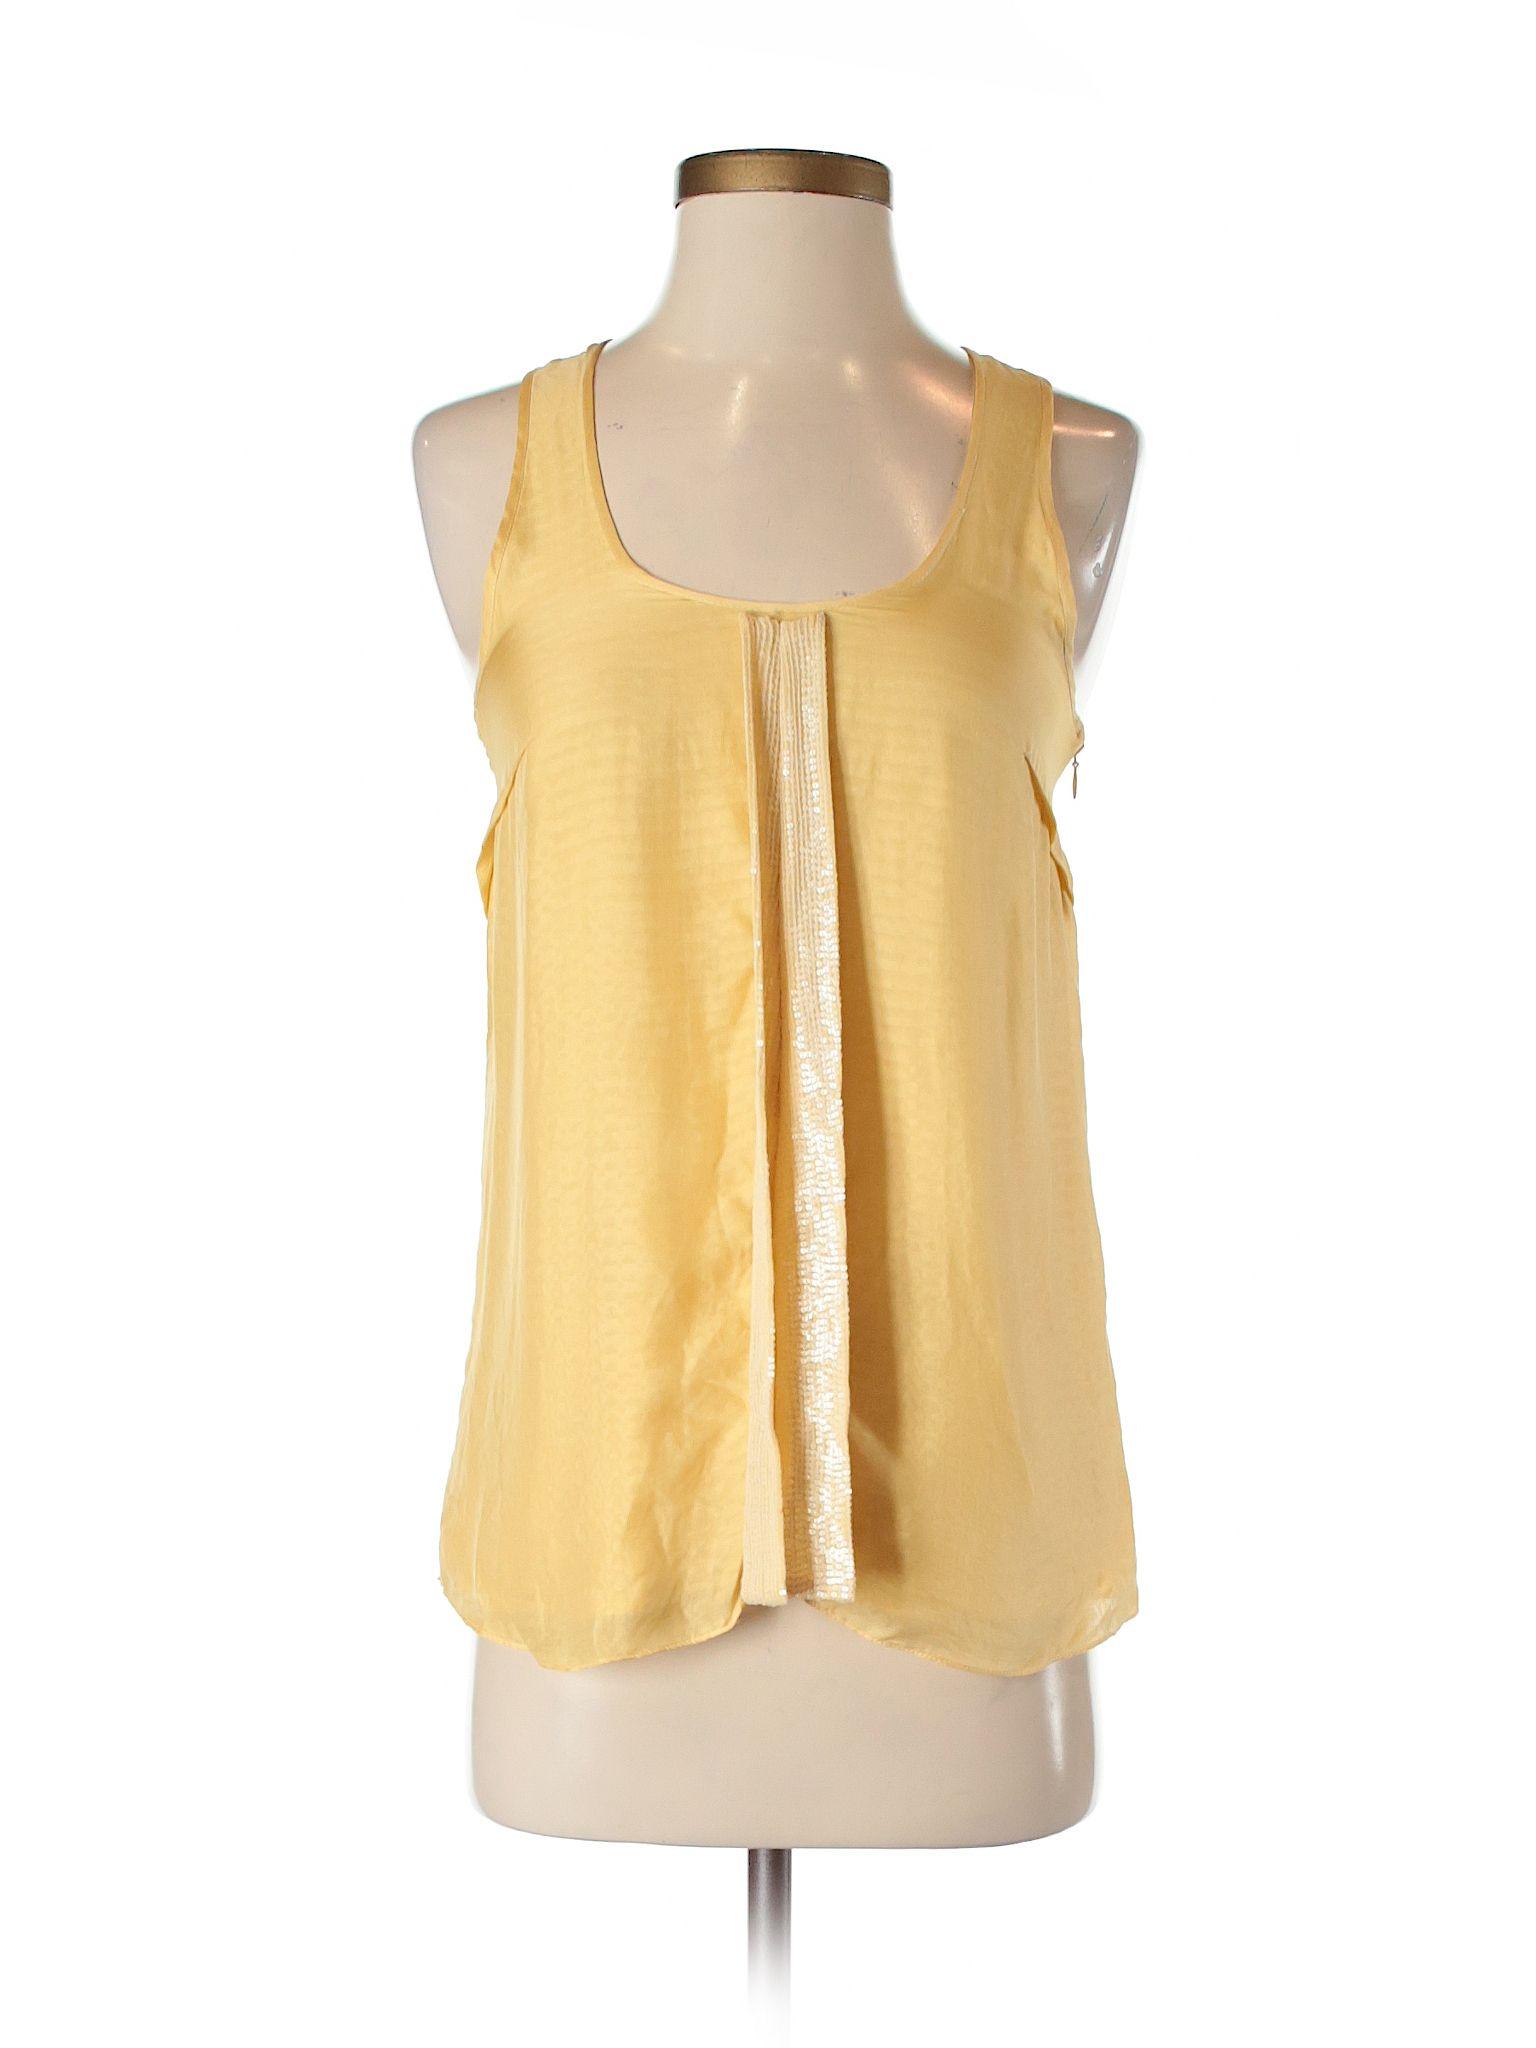 f2279fa53e2f83 Julie Haus Sleeveless Silk Top  Yellow Women s Tops - 25634977